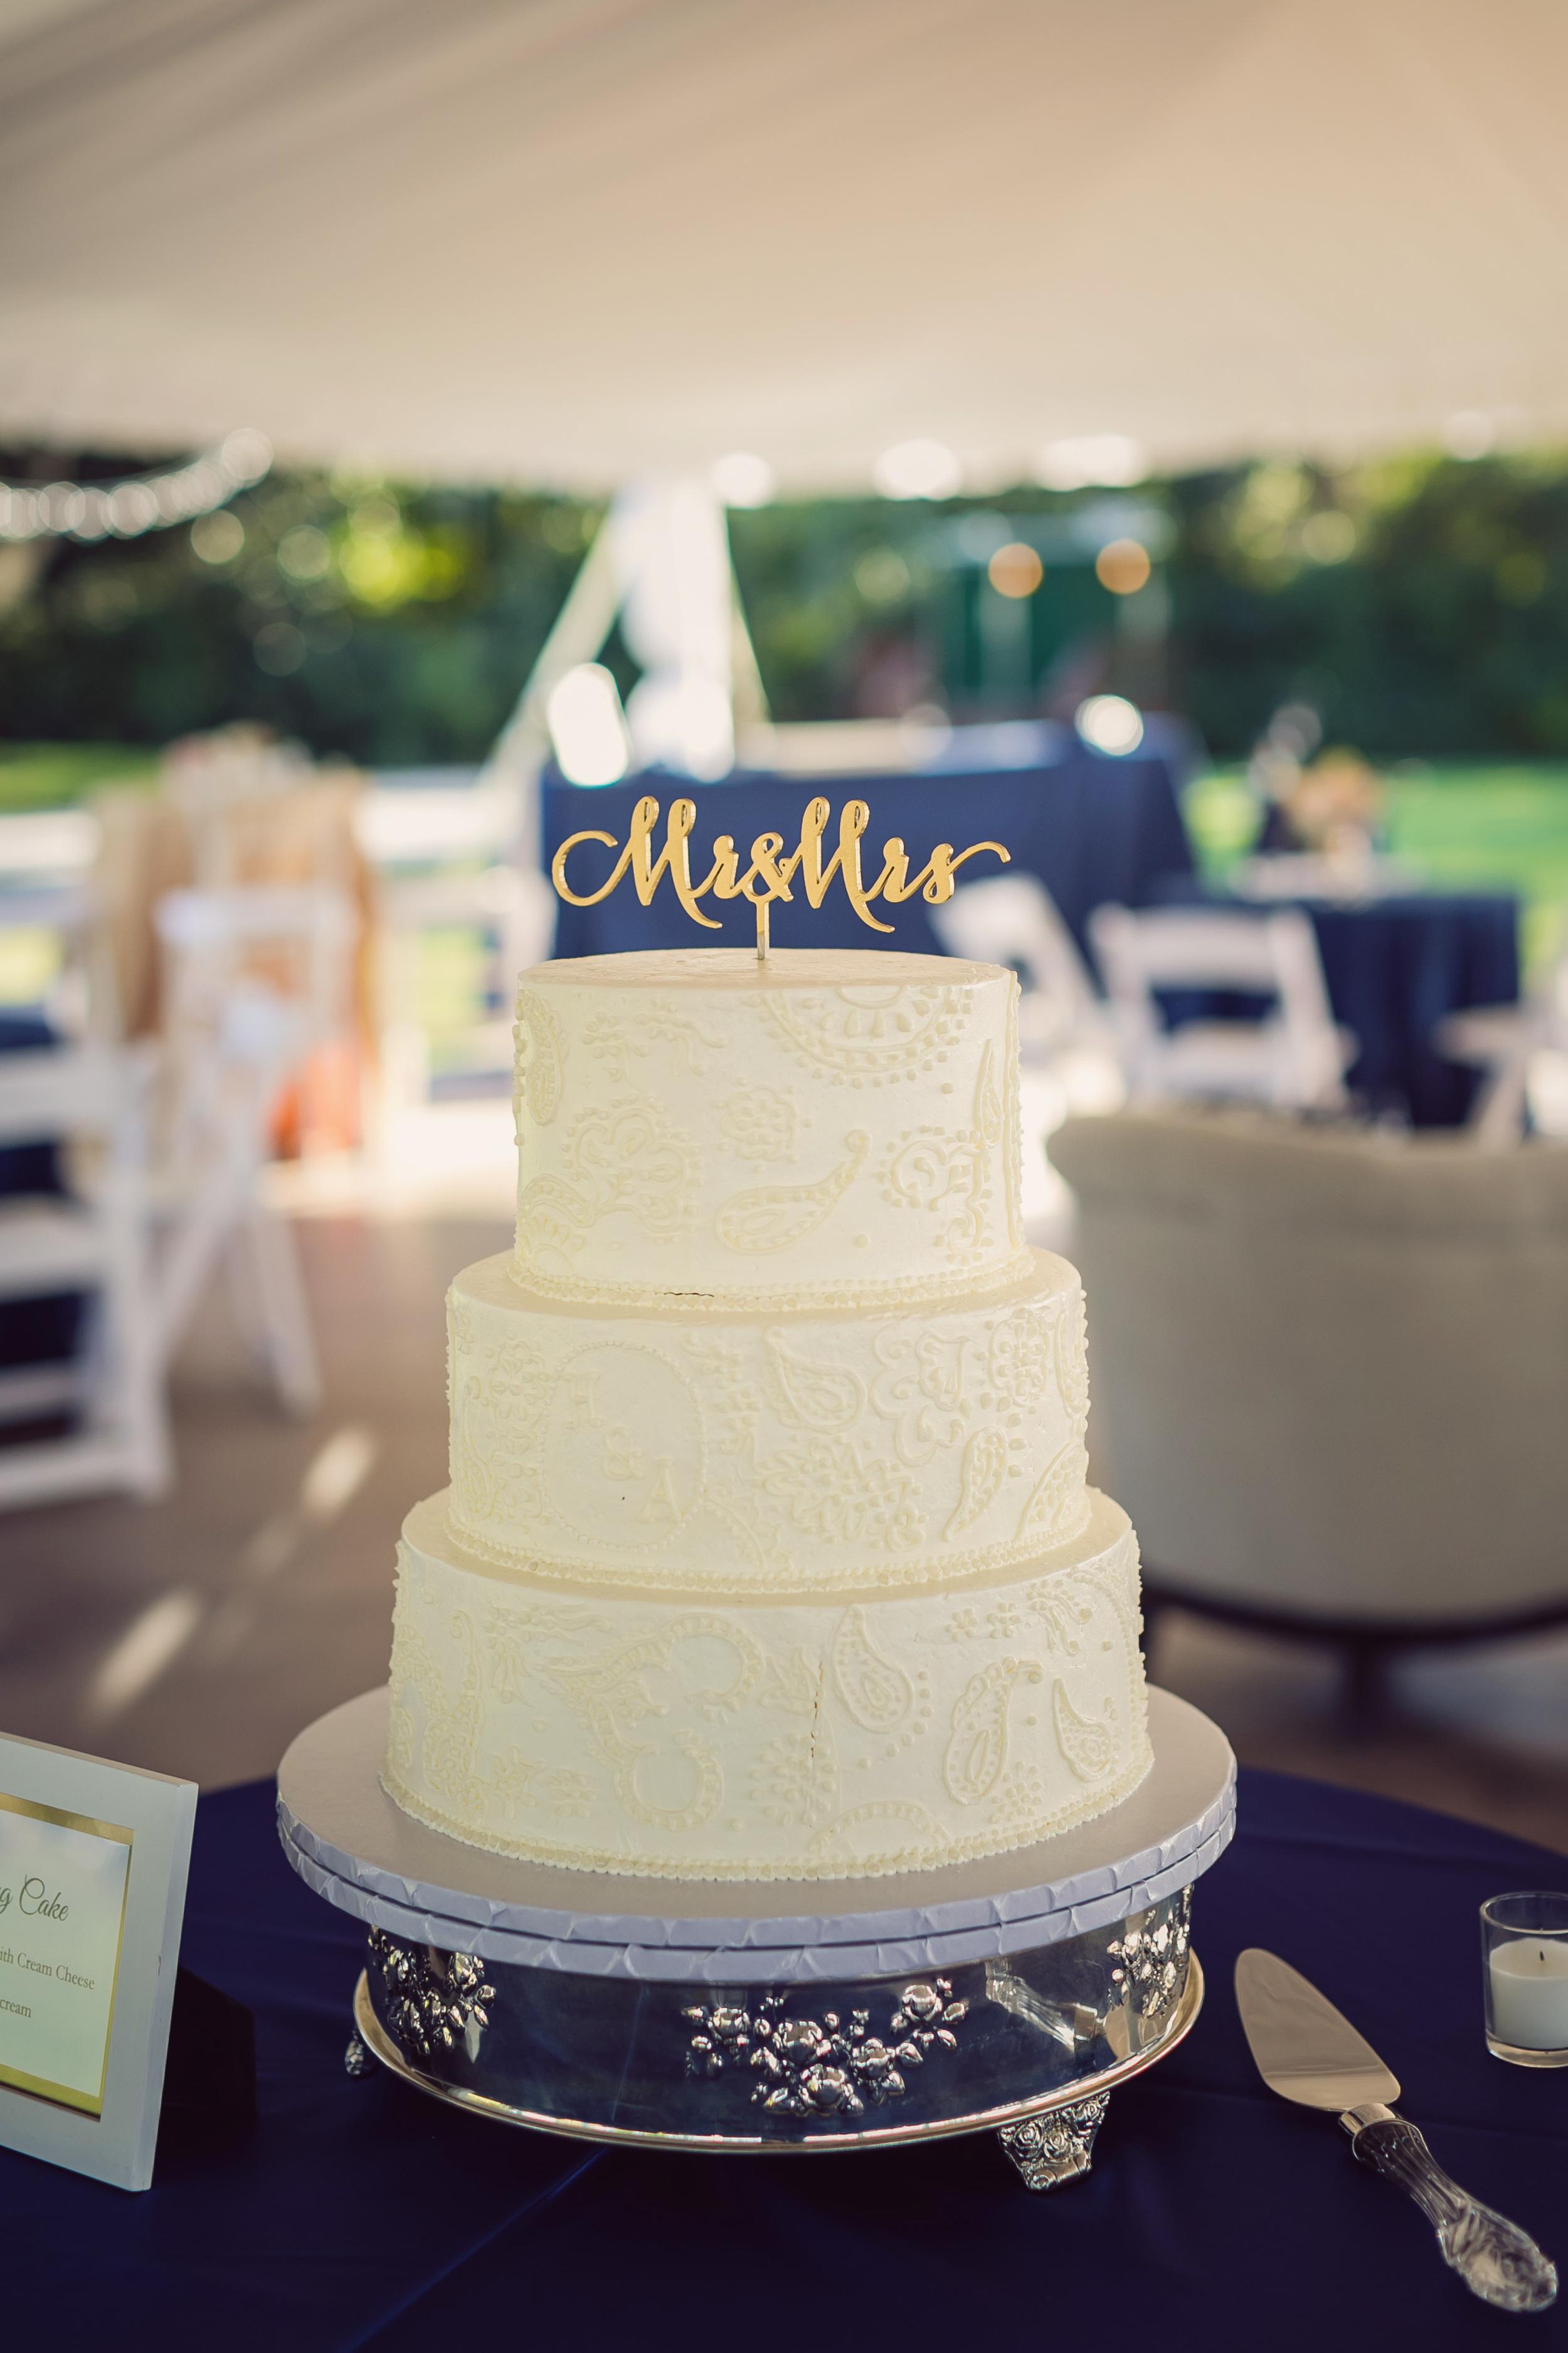 Three-tiered white Charleston wedding cake by Pawleys Island Bakery